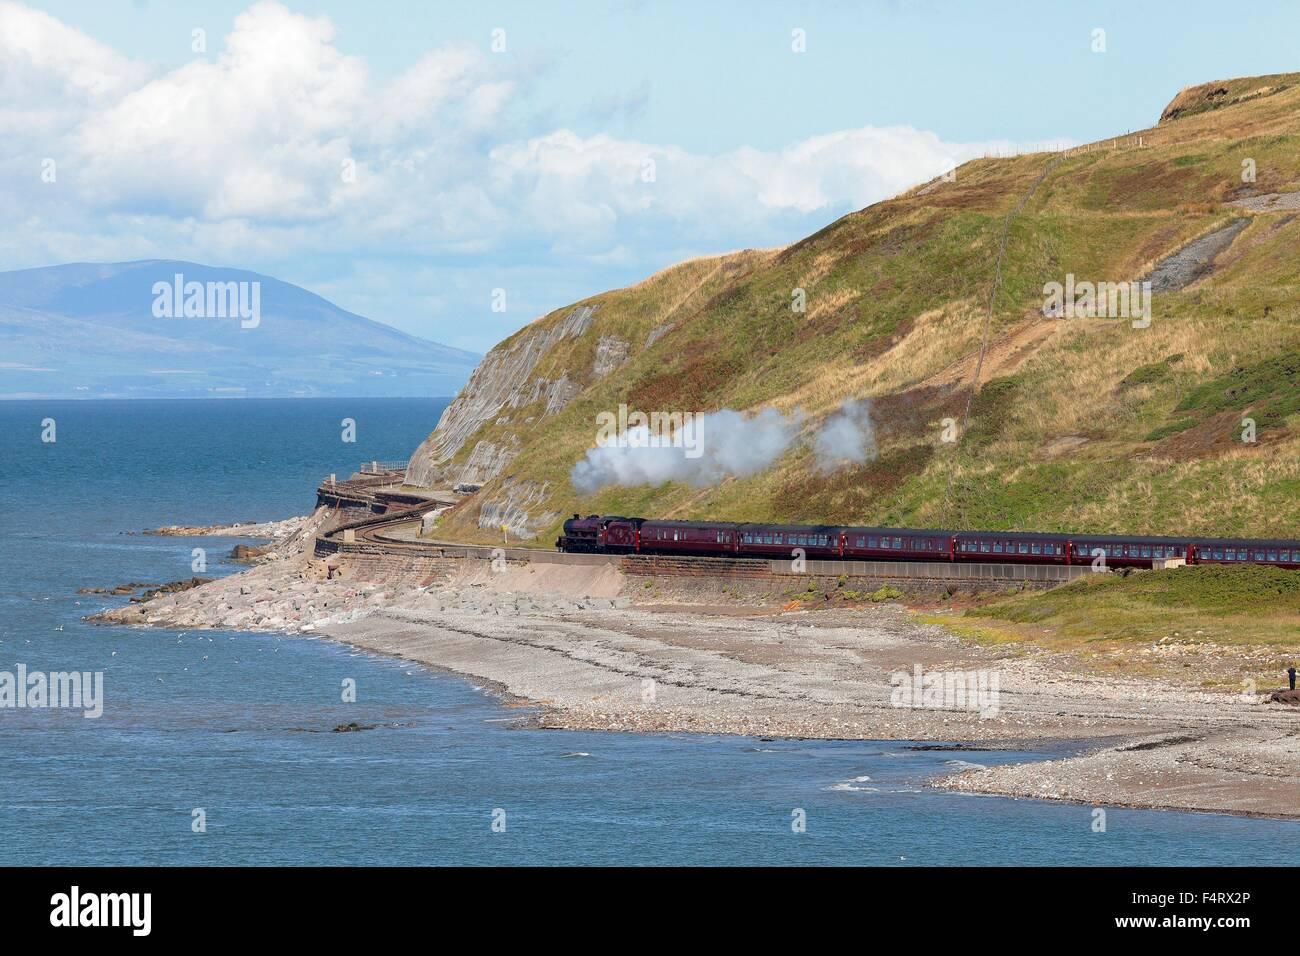 Steam locomotive LMS Jubilee Class 45699 Galatea. Parton Bay, Parton, Whitehaven, Cumbria, England, UK. - Stock Image